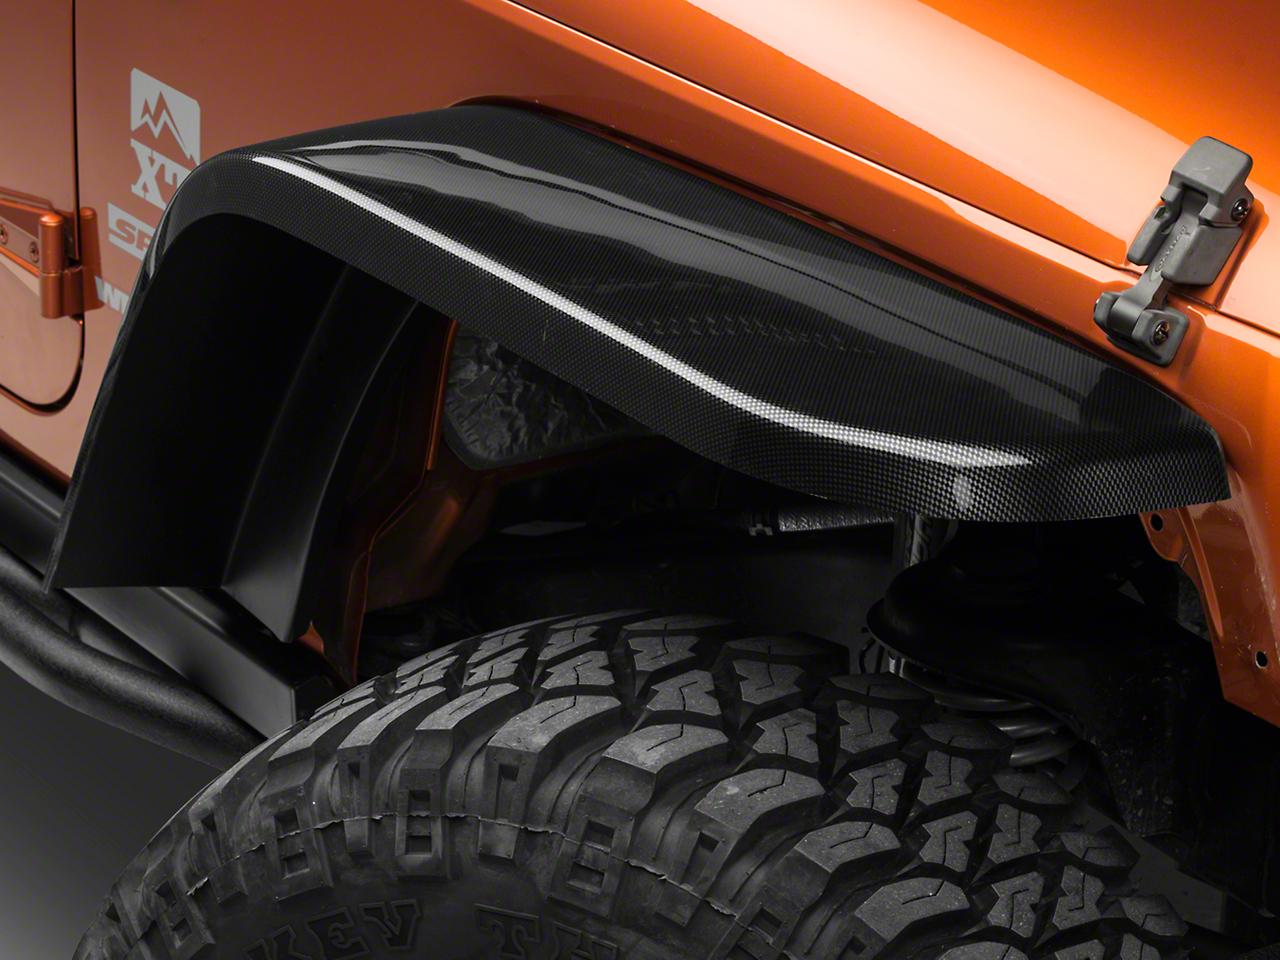 MCE Gen-III Carbon Fiber Flexible Flat Fenders (07-16 Wrangler JK)